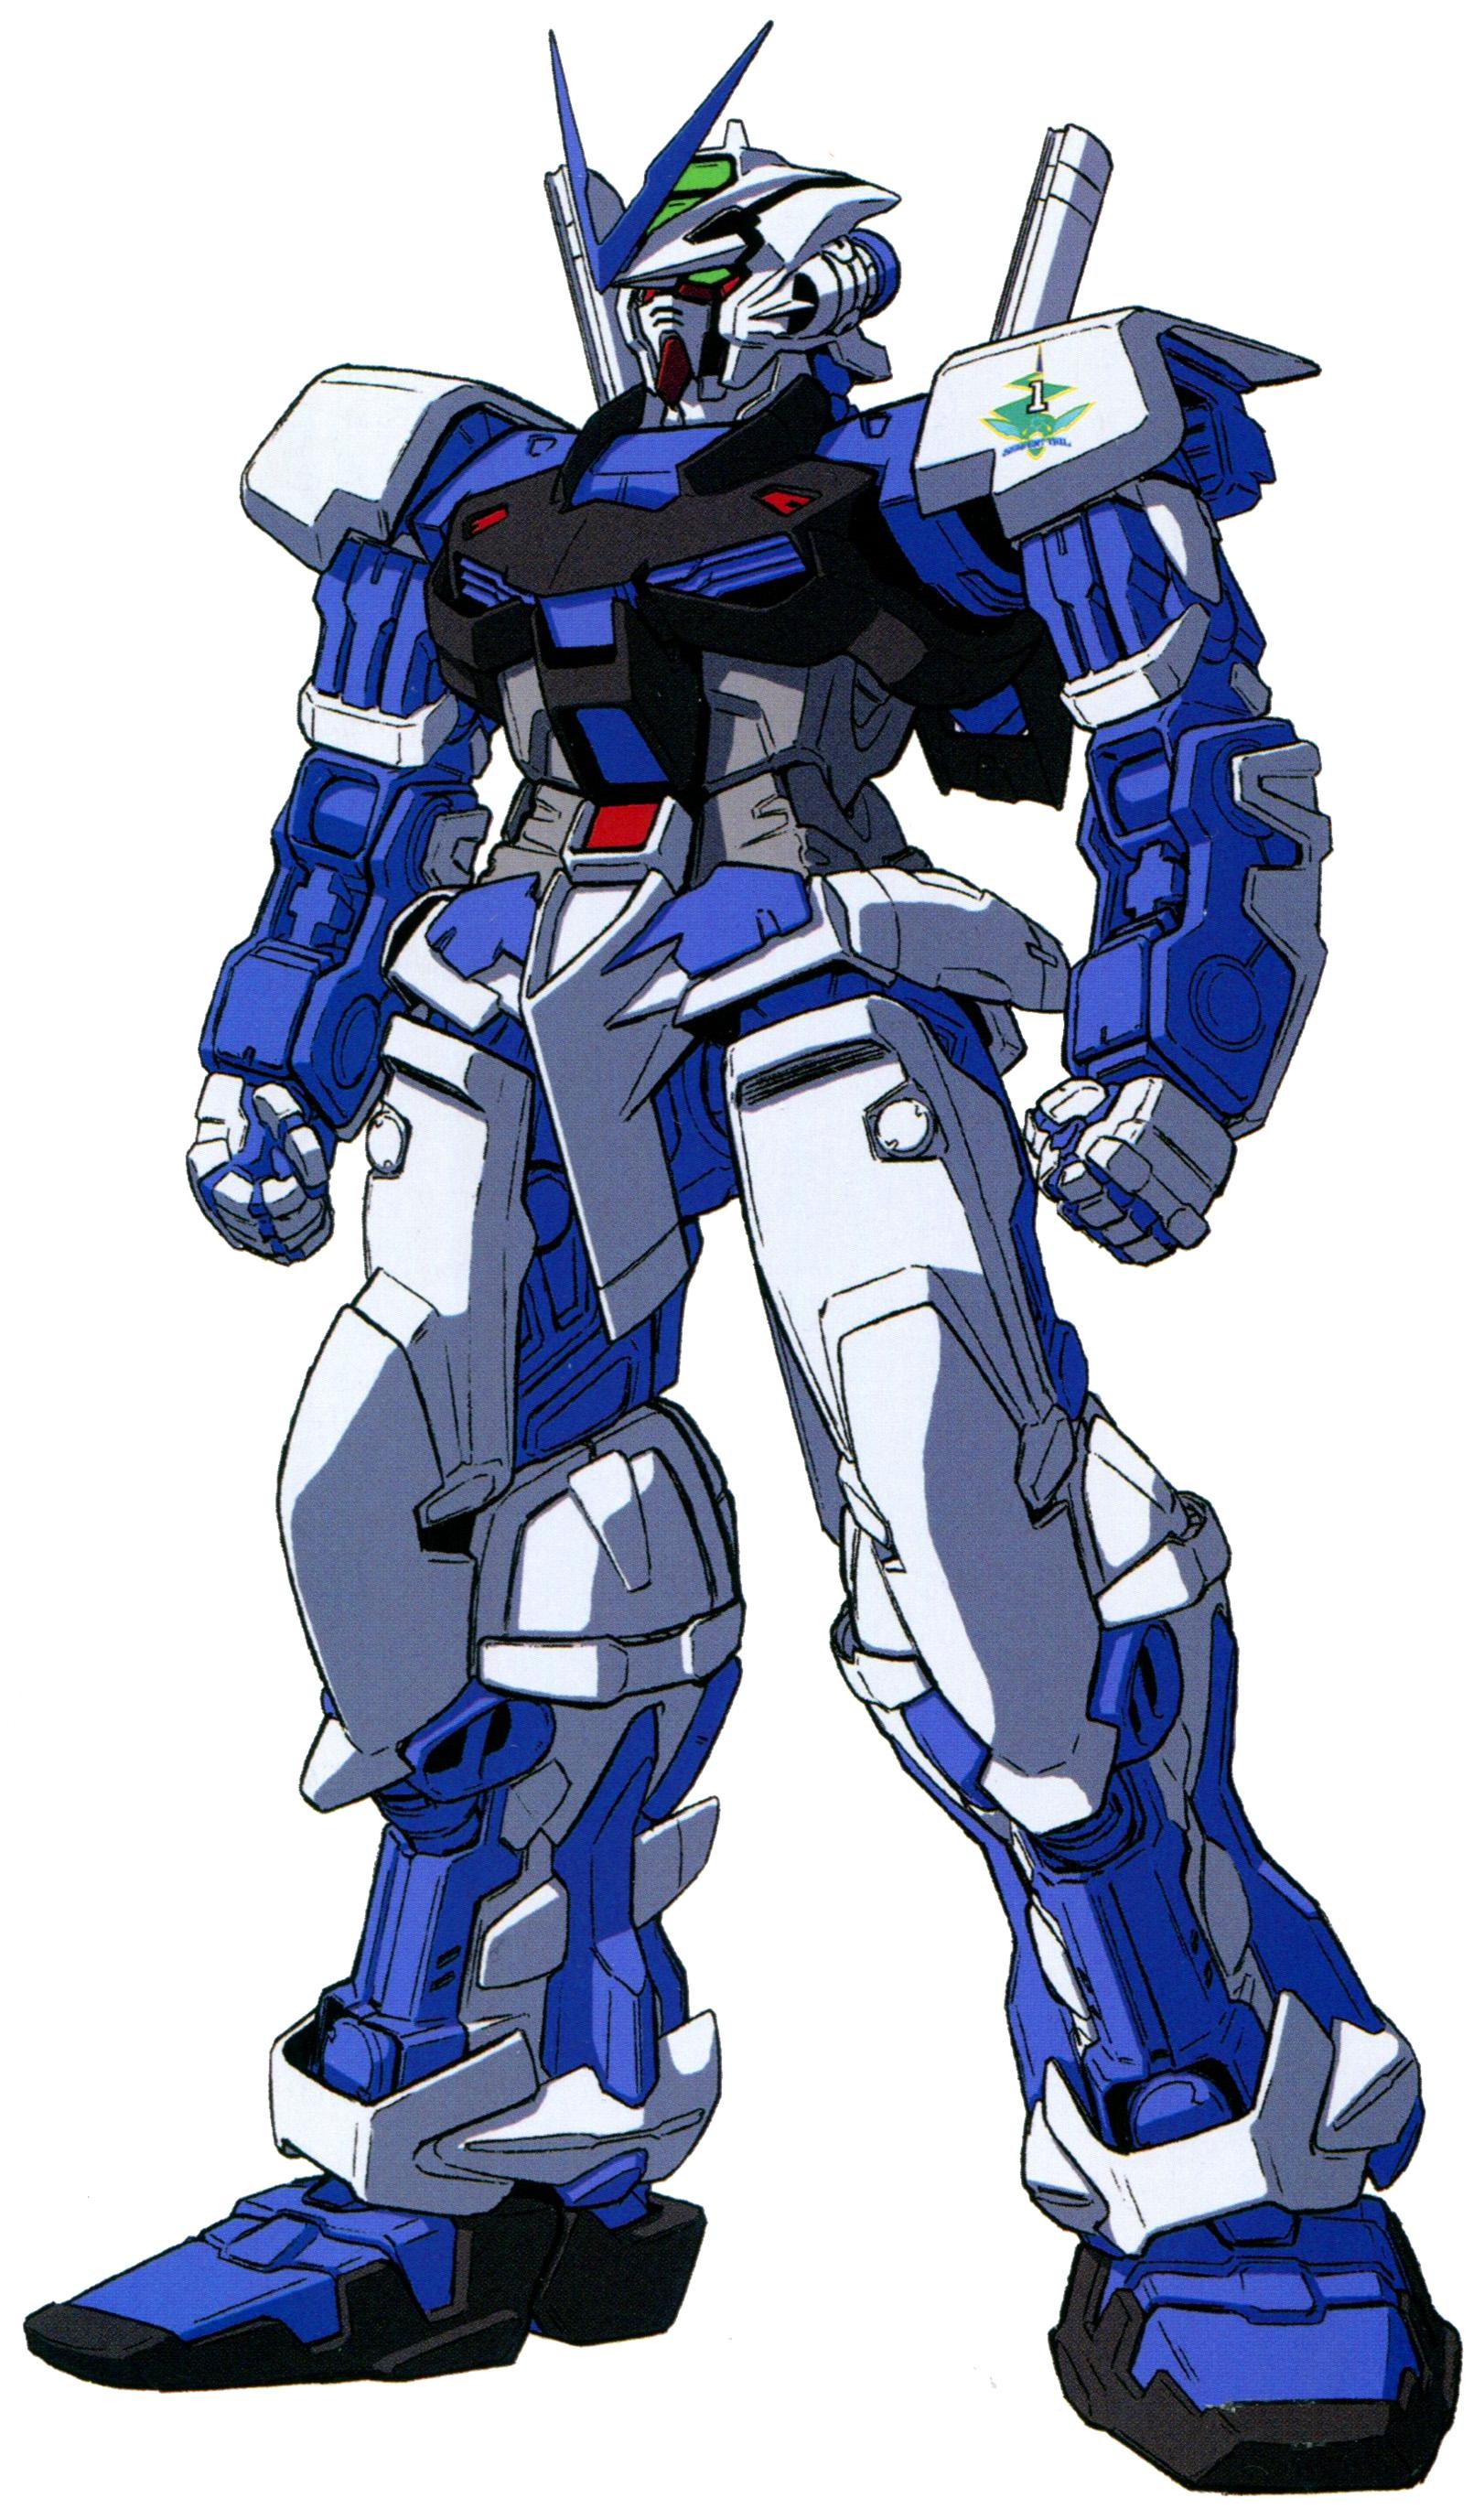 Mbf P03 Gundam Astray Blue Frame The Gundam Wiki